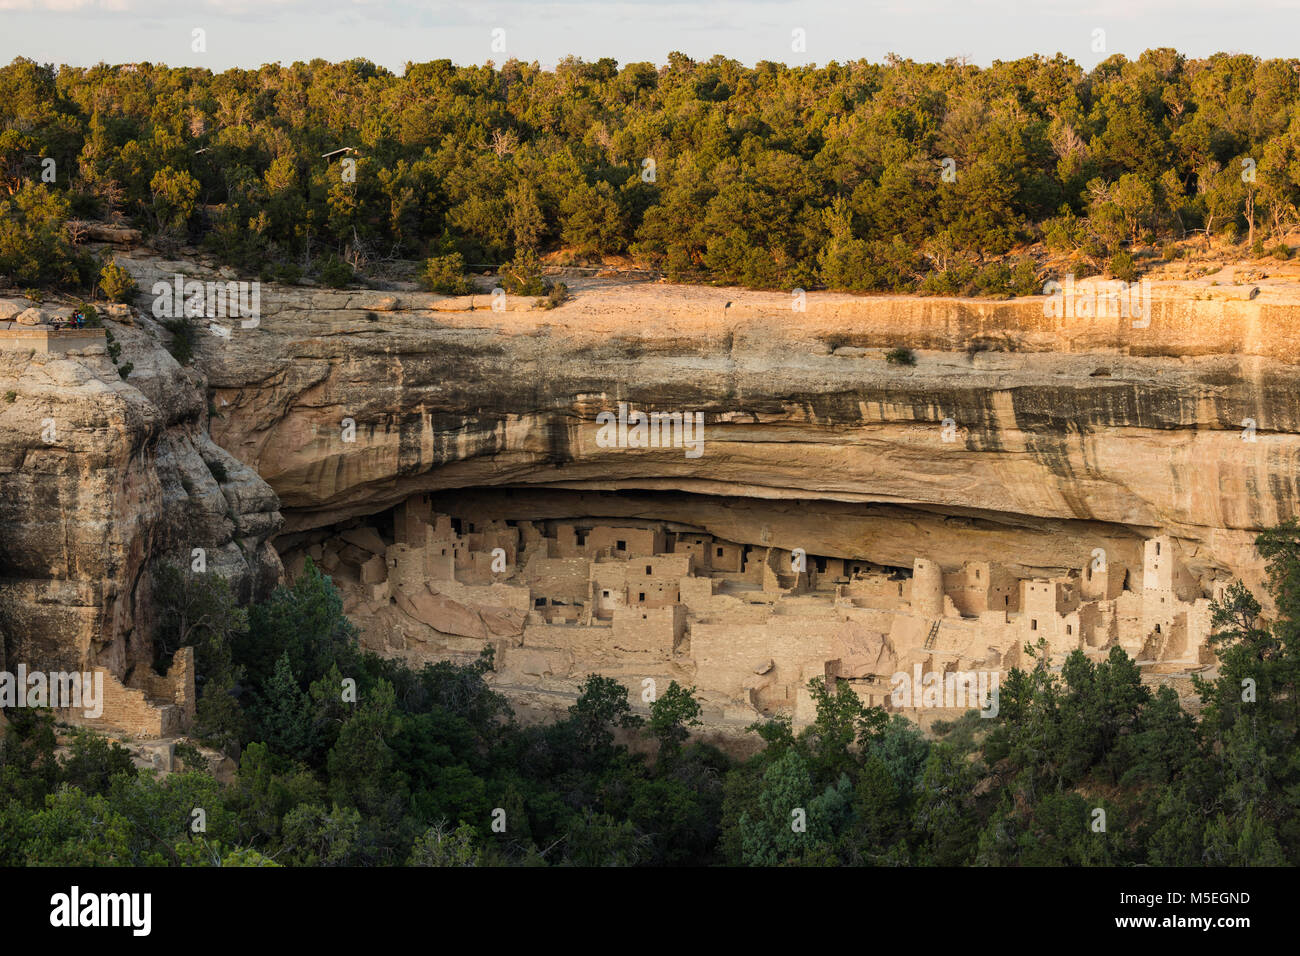 Cliff Palace, Mesa Verde National Park, Colorado - Stock Image